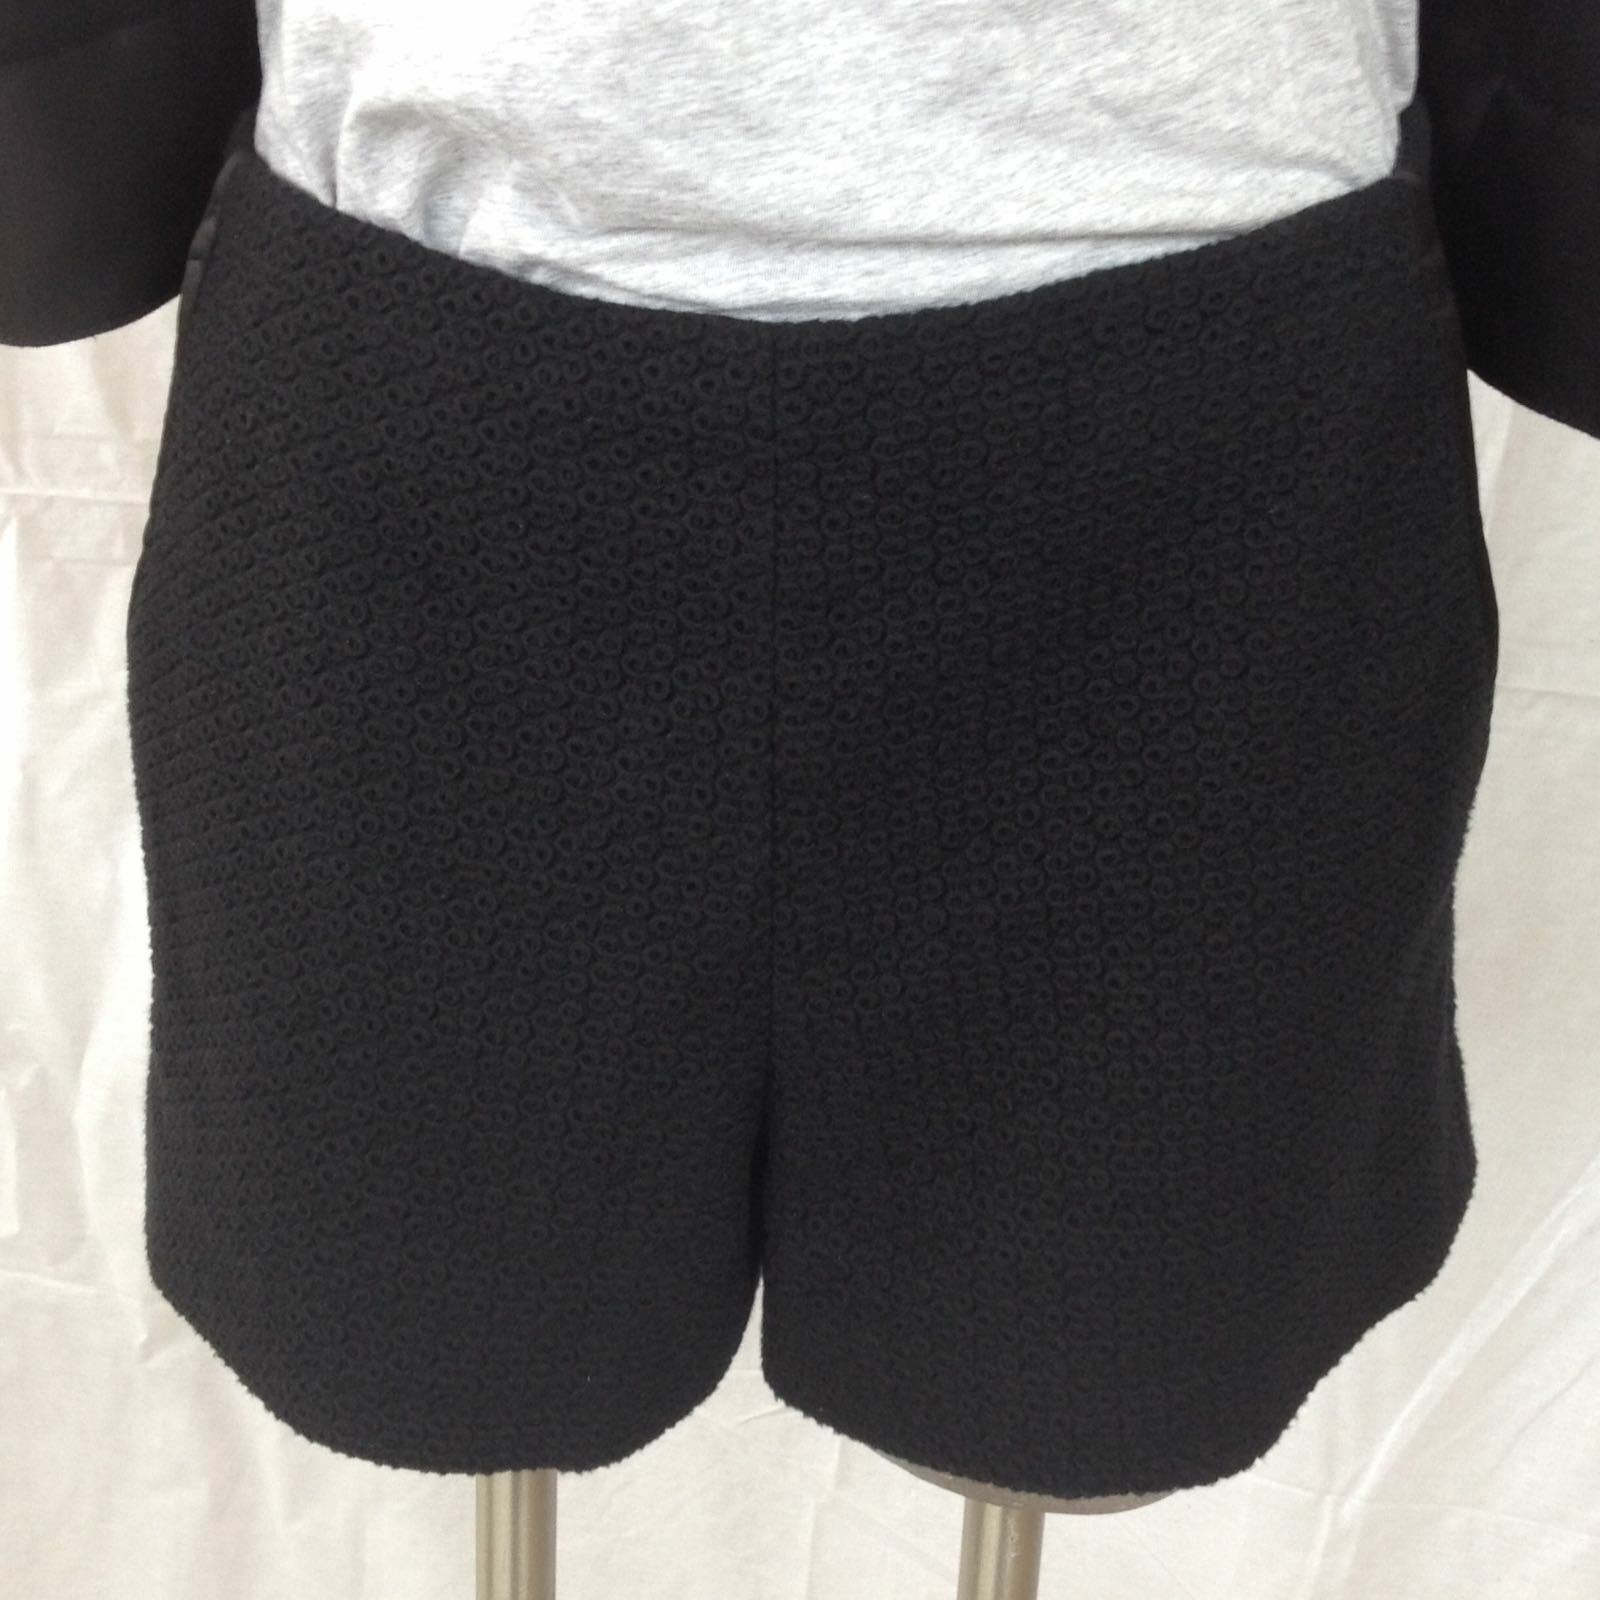 Rag and bone womens cora shorts size 4